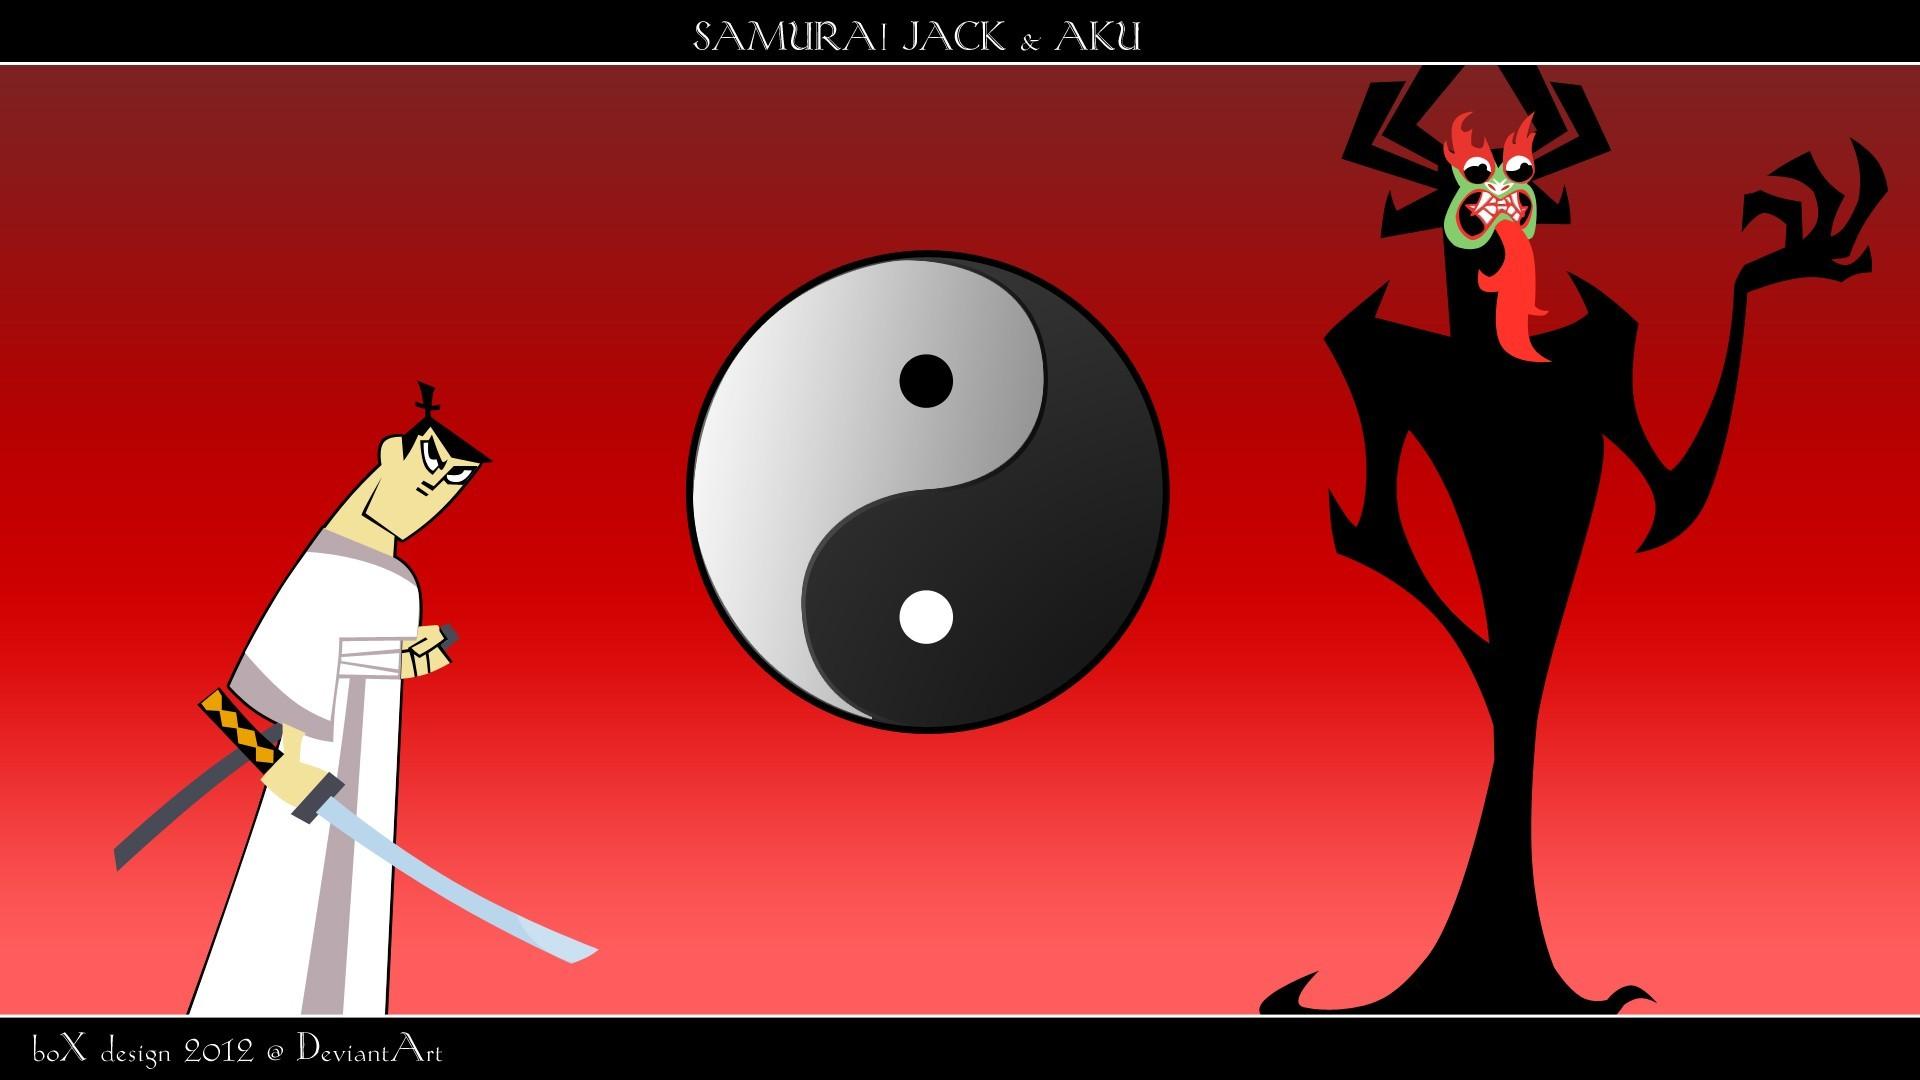 Res: 1920x1080, samurai-jack-wallpaper-1920x108-WTG3098427. downloado